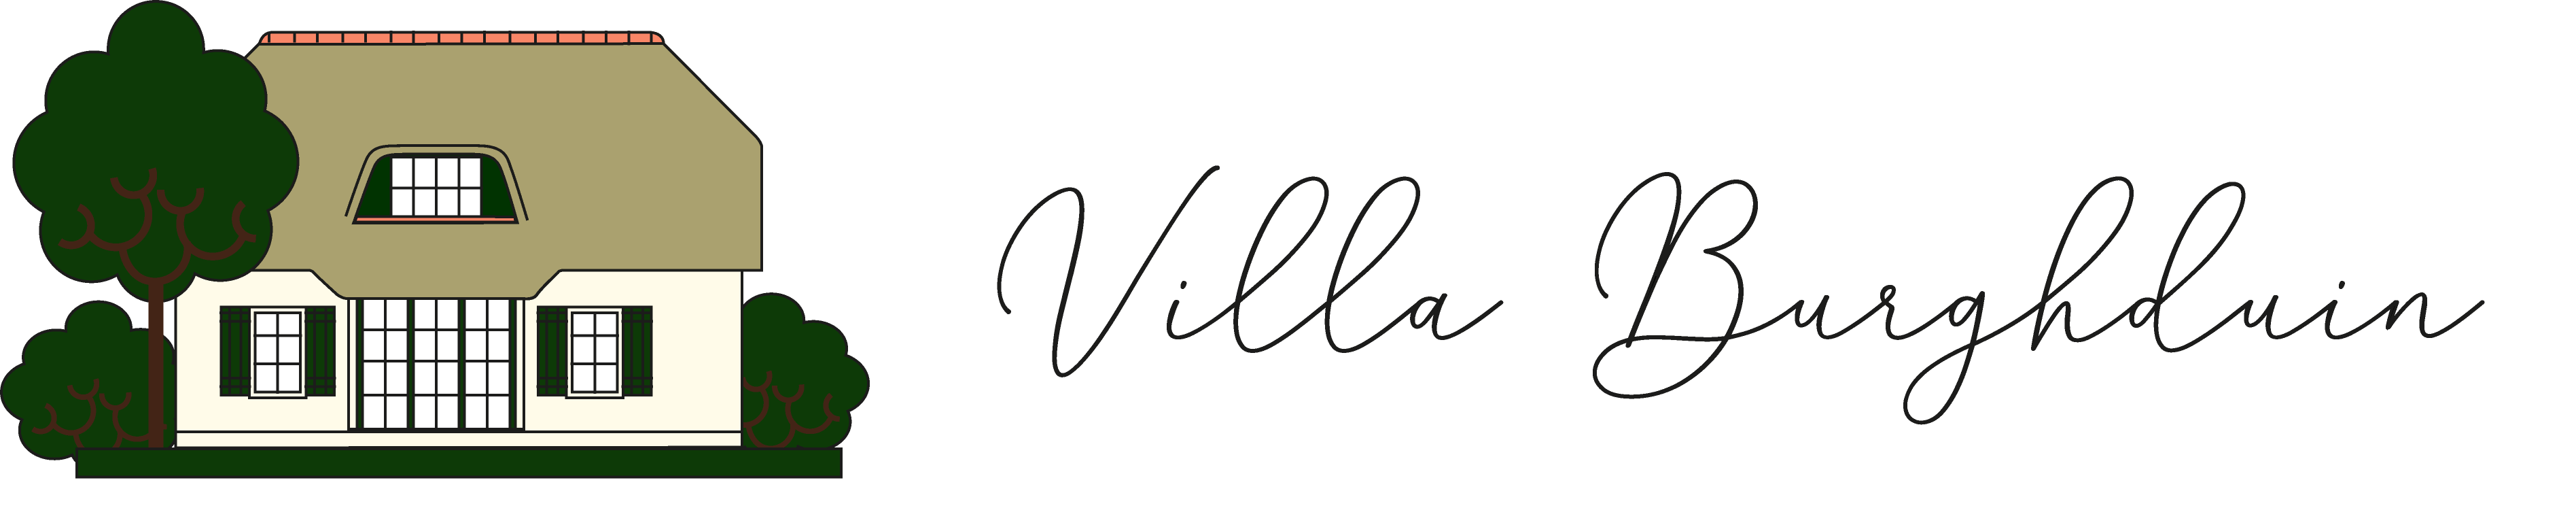 Villa Burghduin